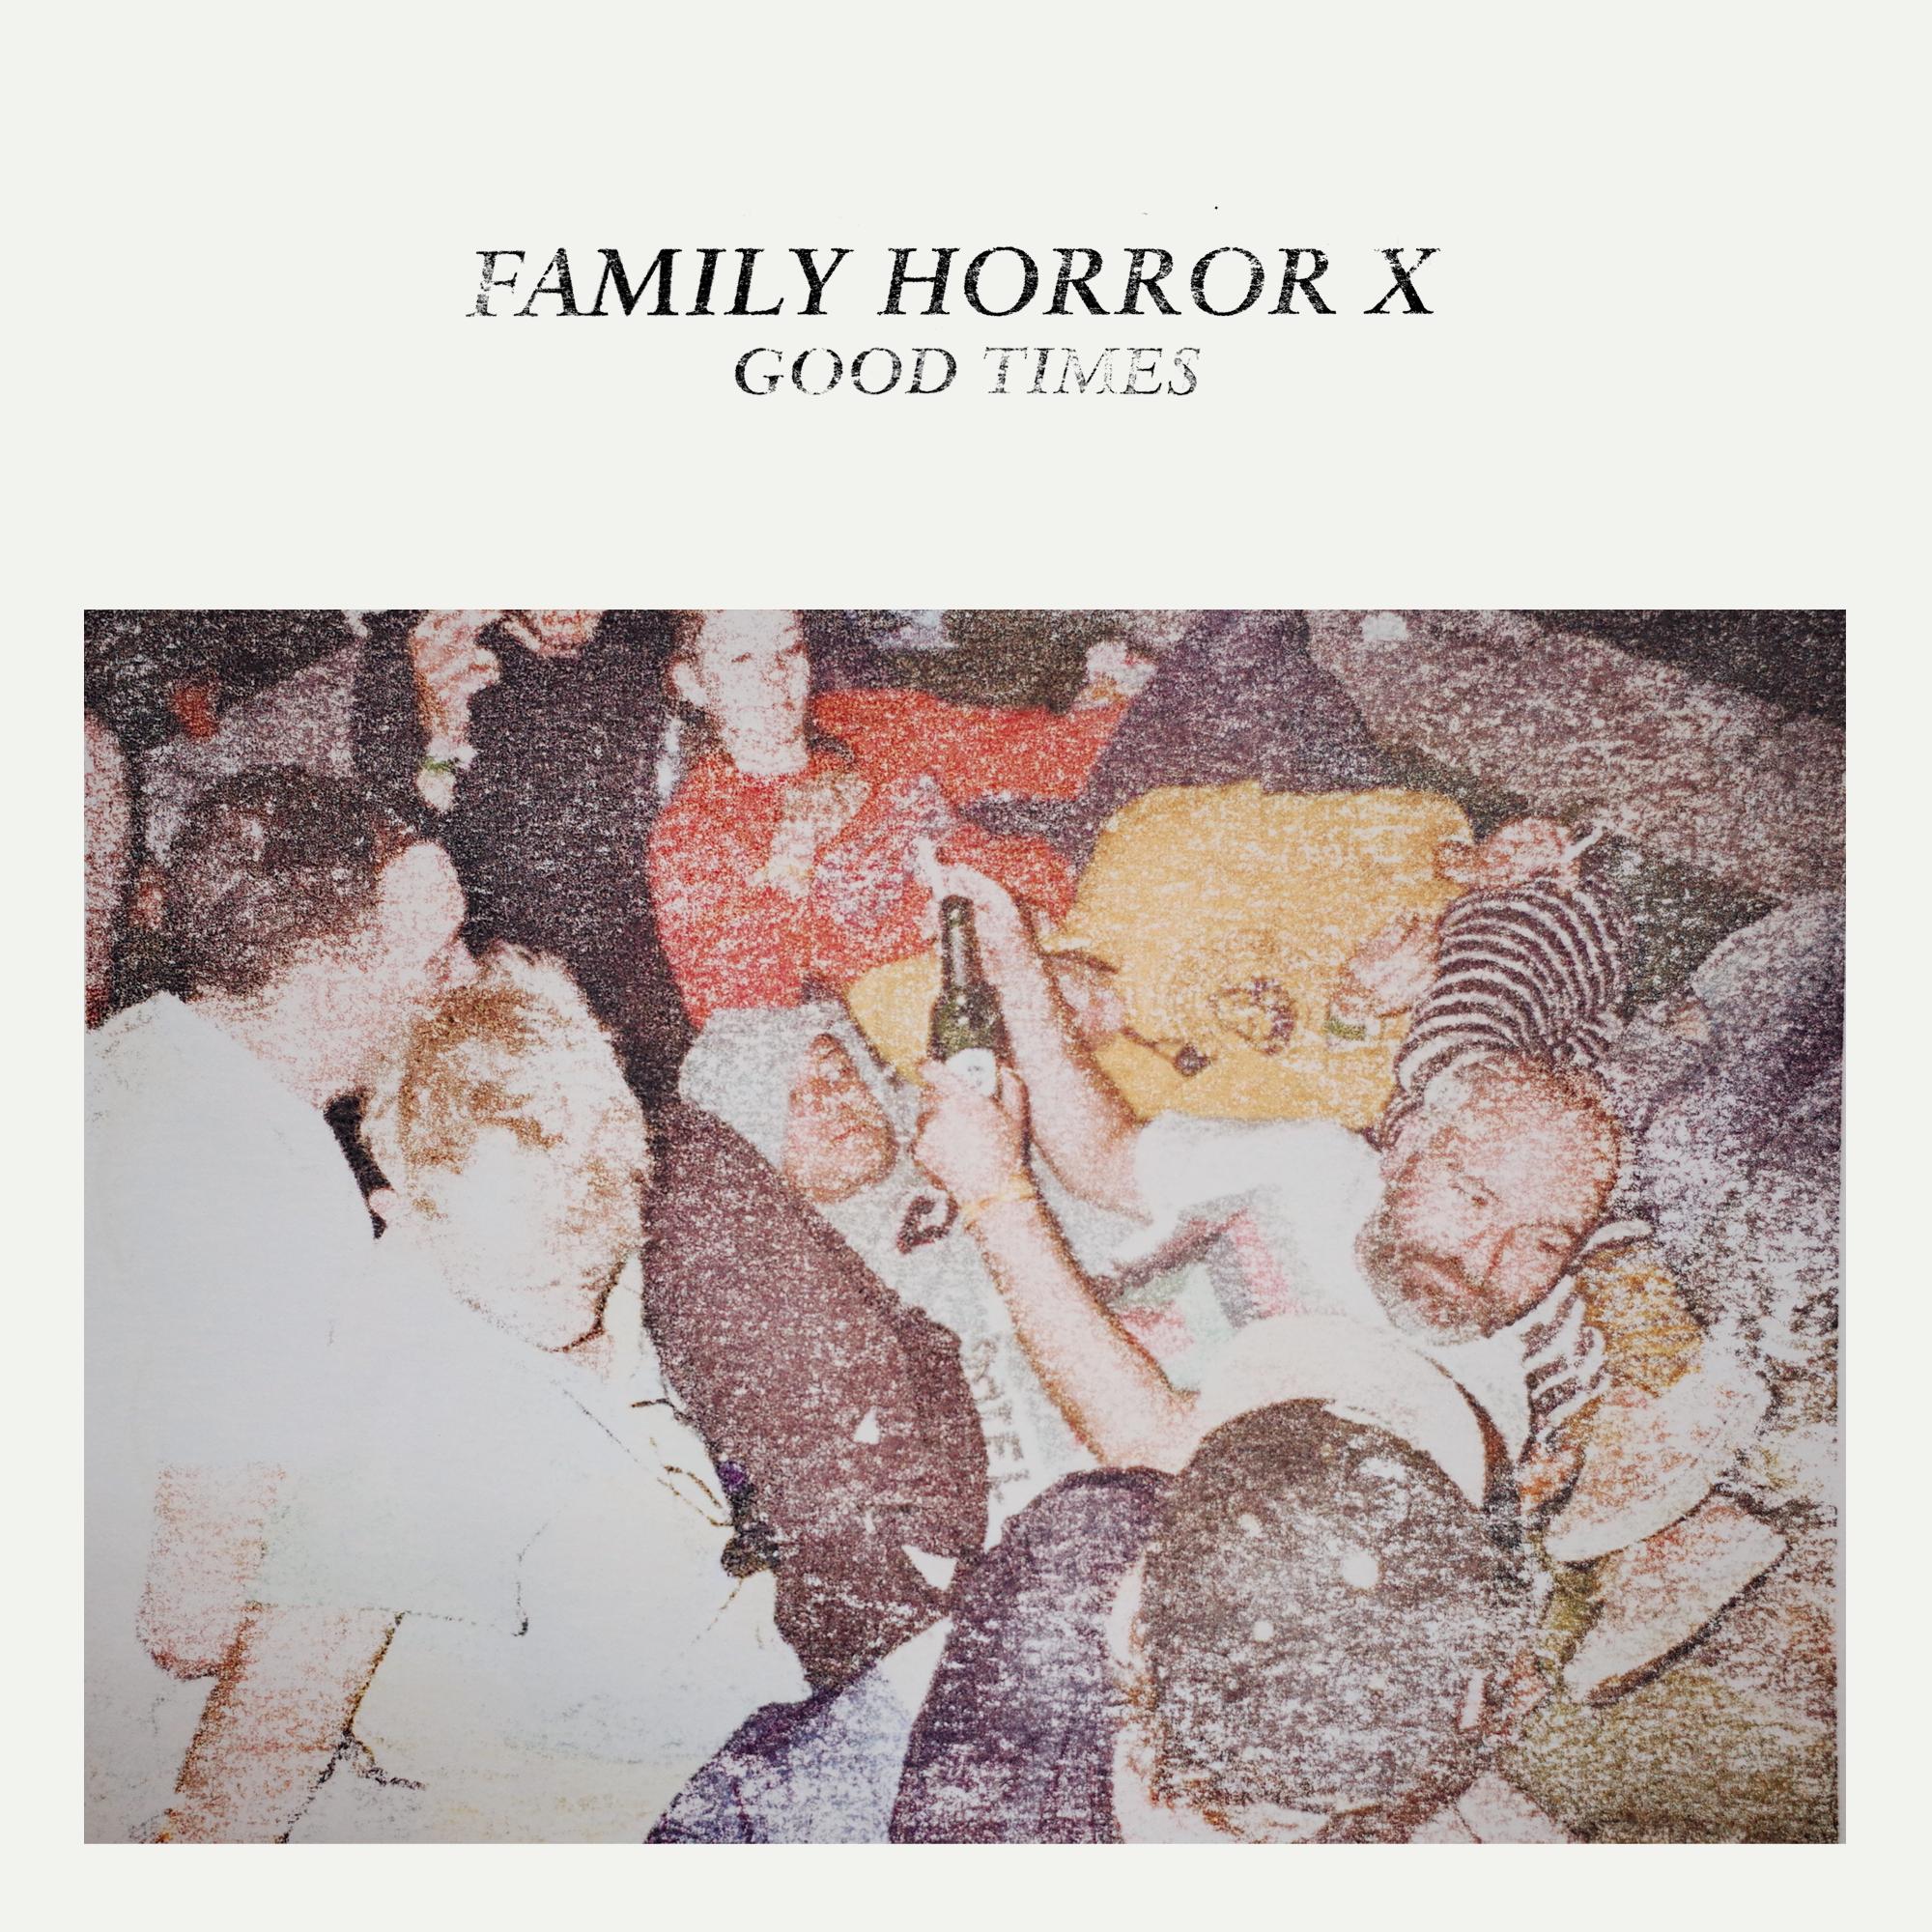 Family Horror X